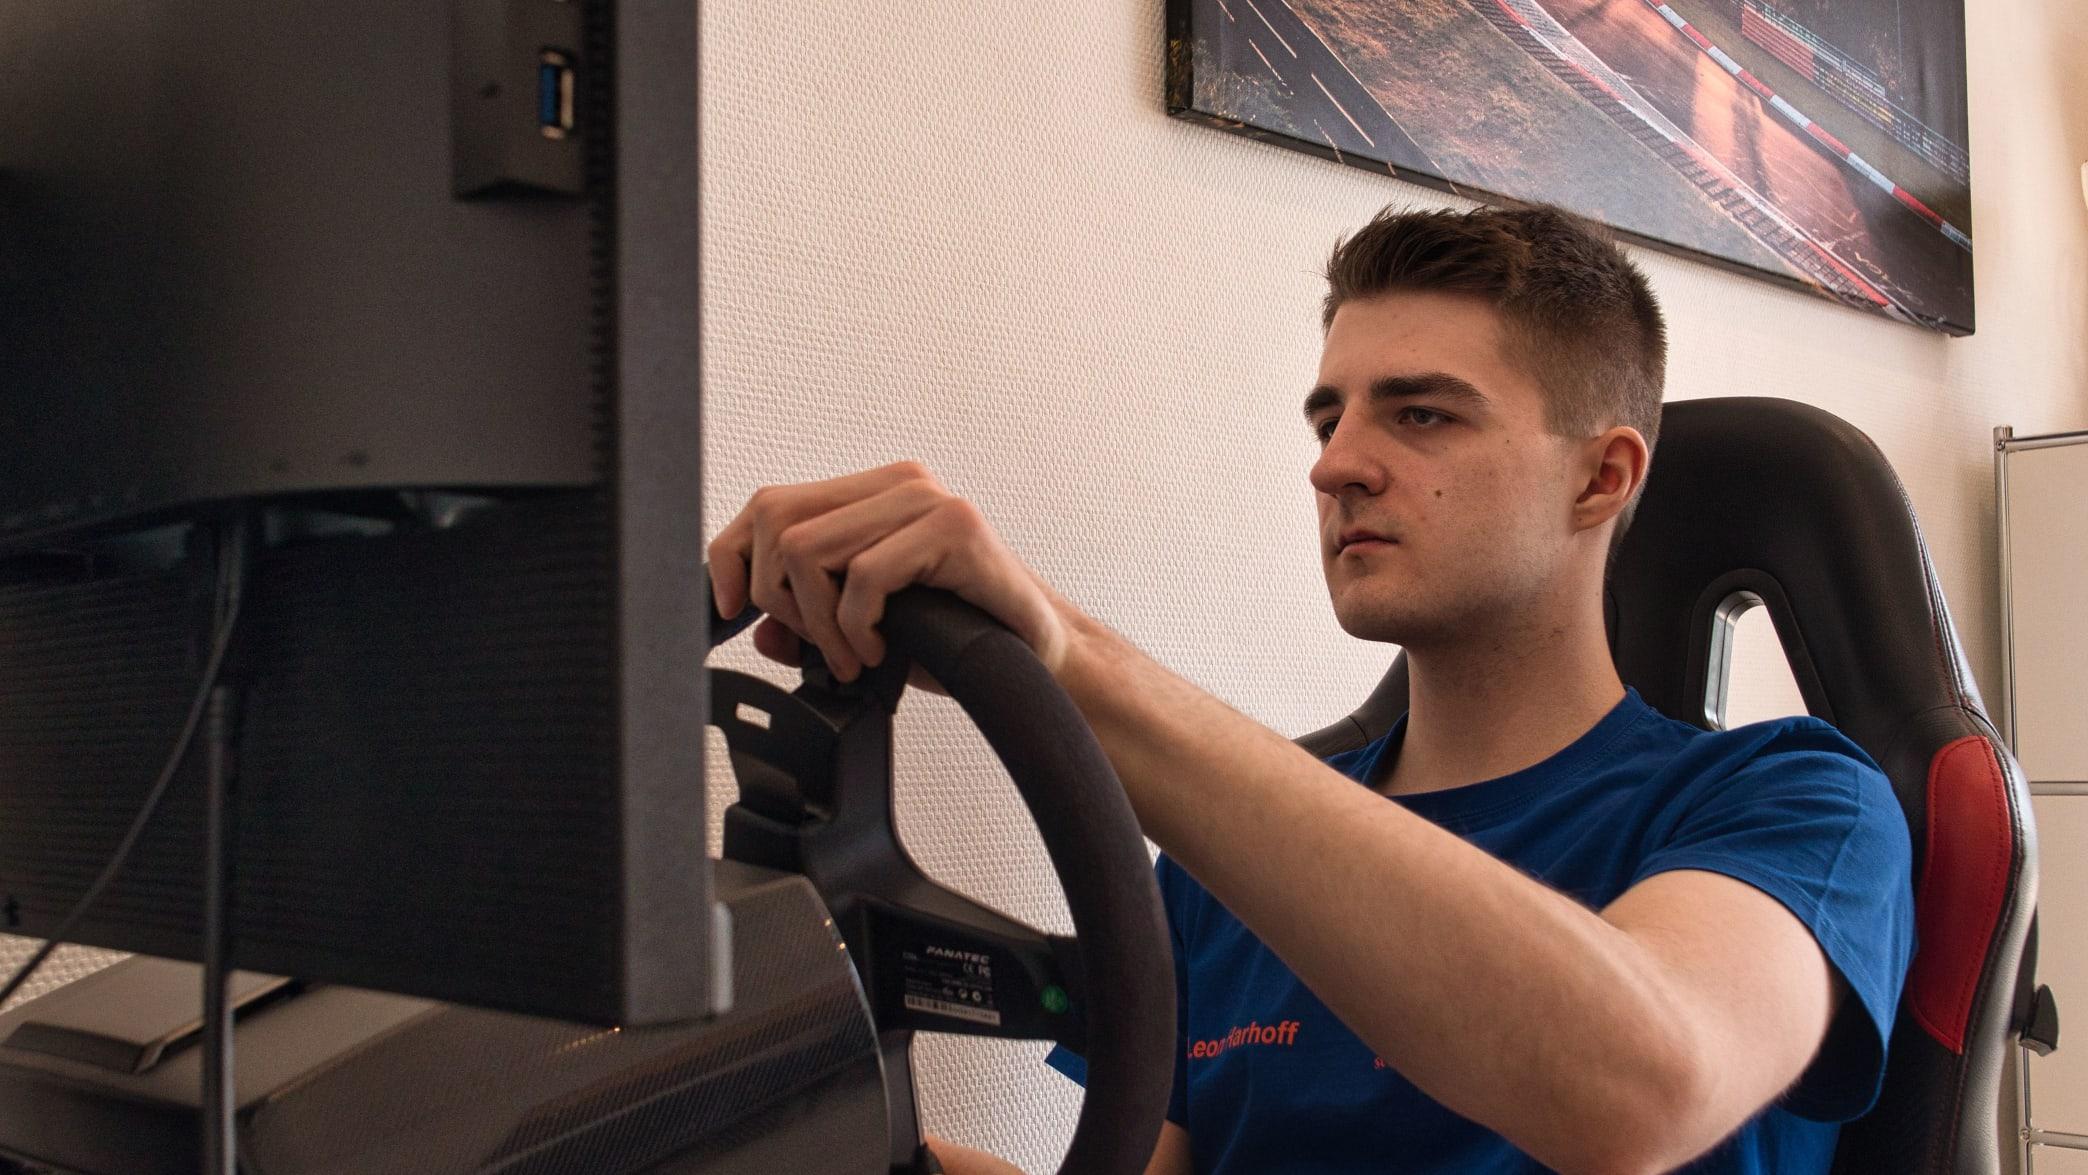 Leon Harhoff im Sim-Racing-Simulator im ADAC Ortsclub Scuderia Augustusburg Brühl